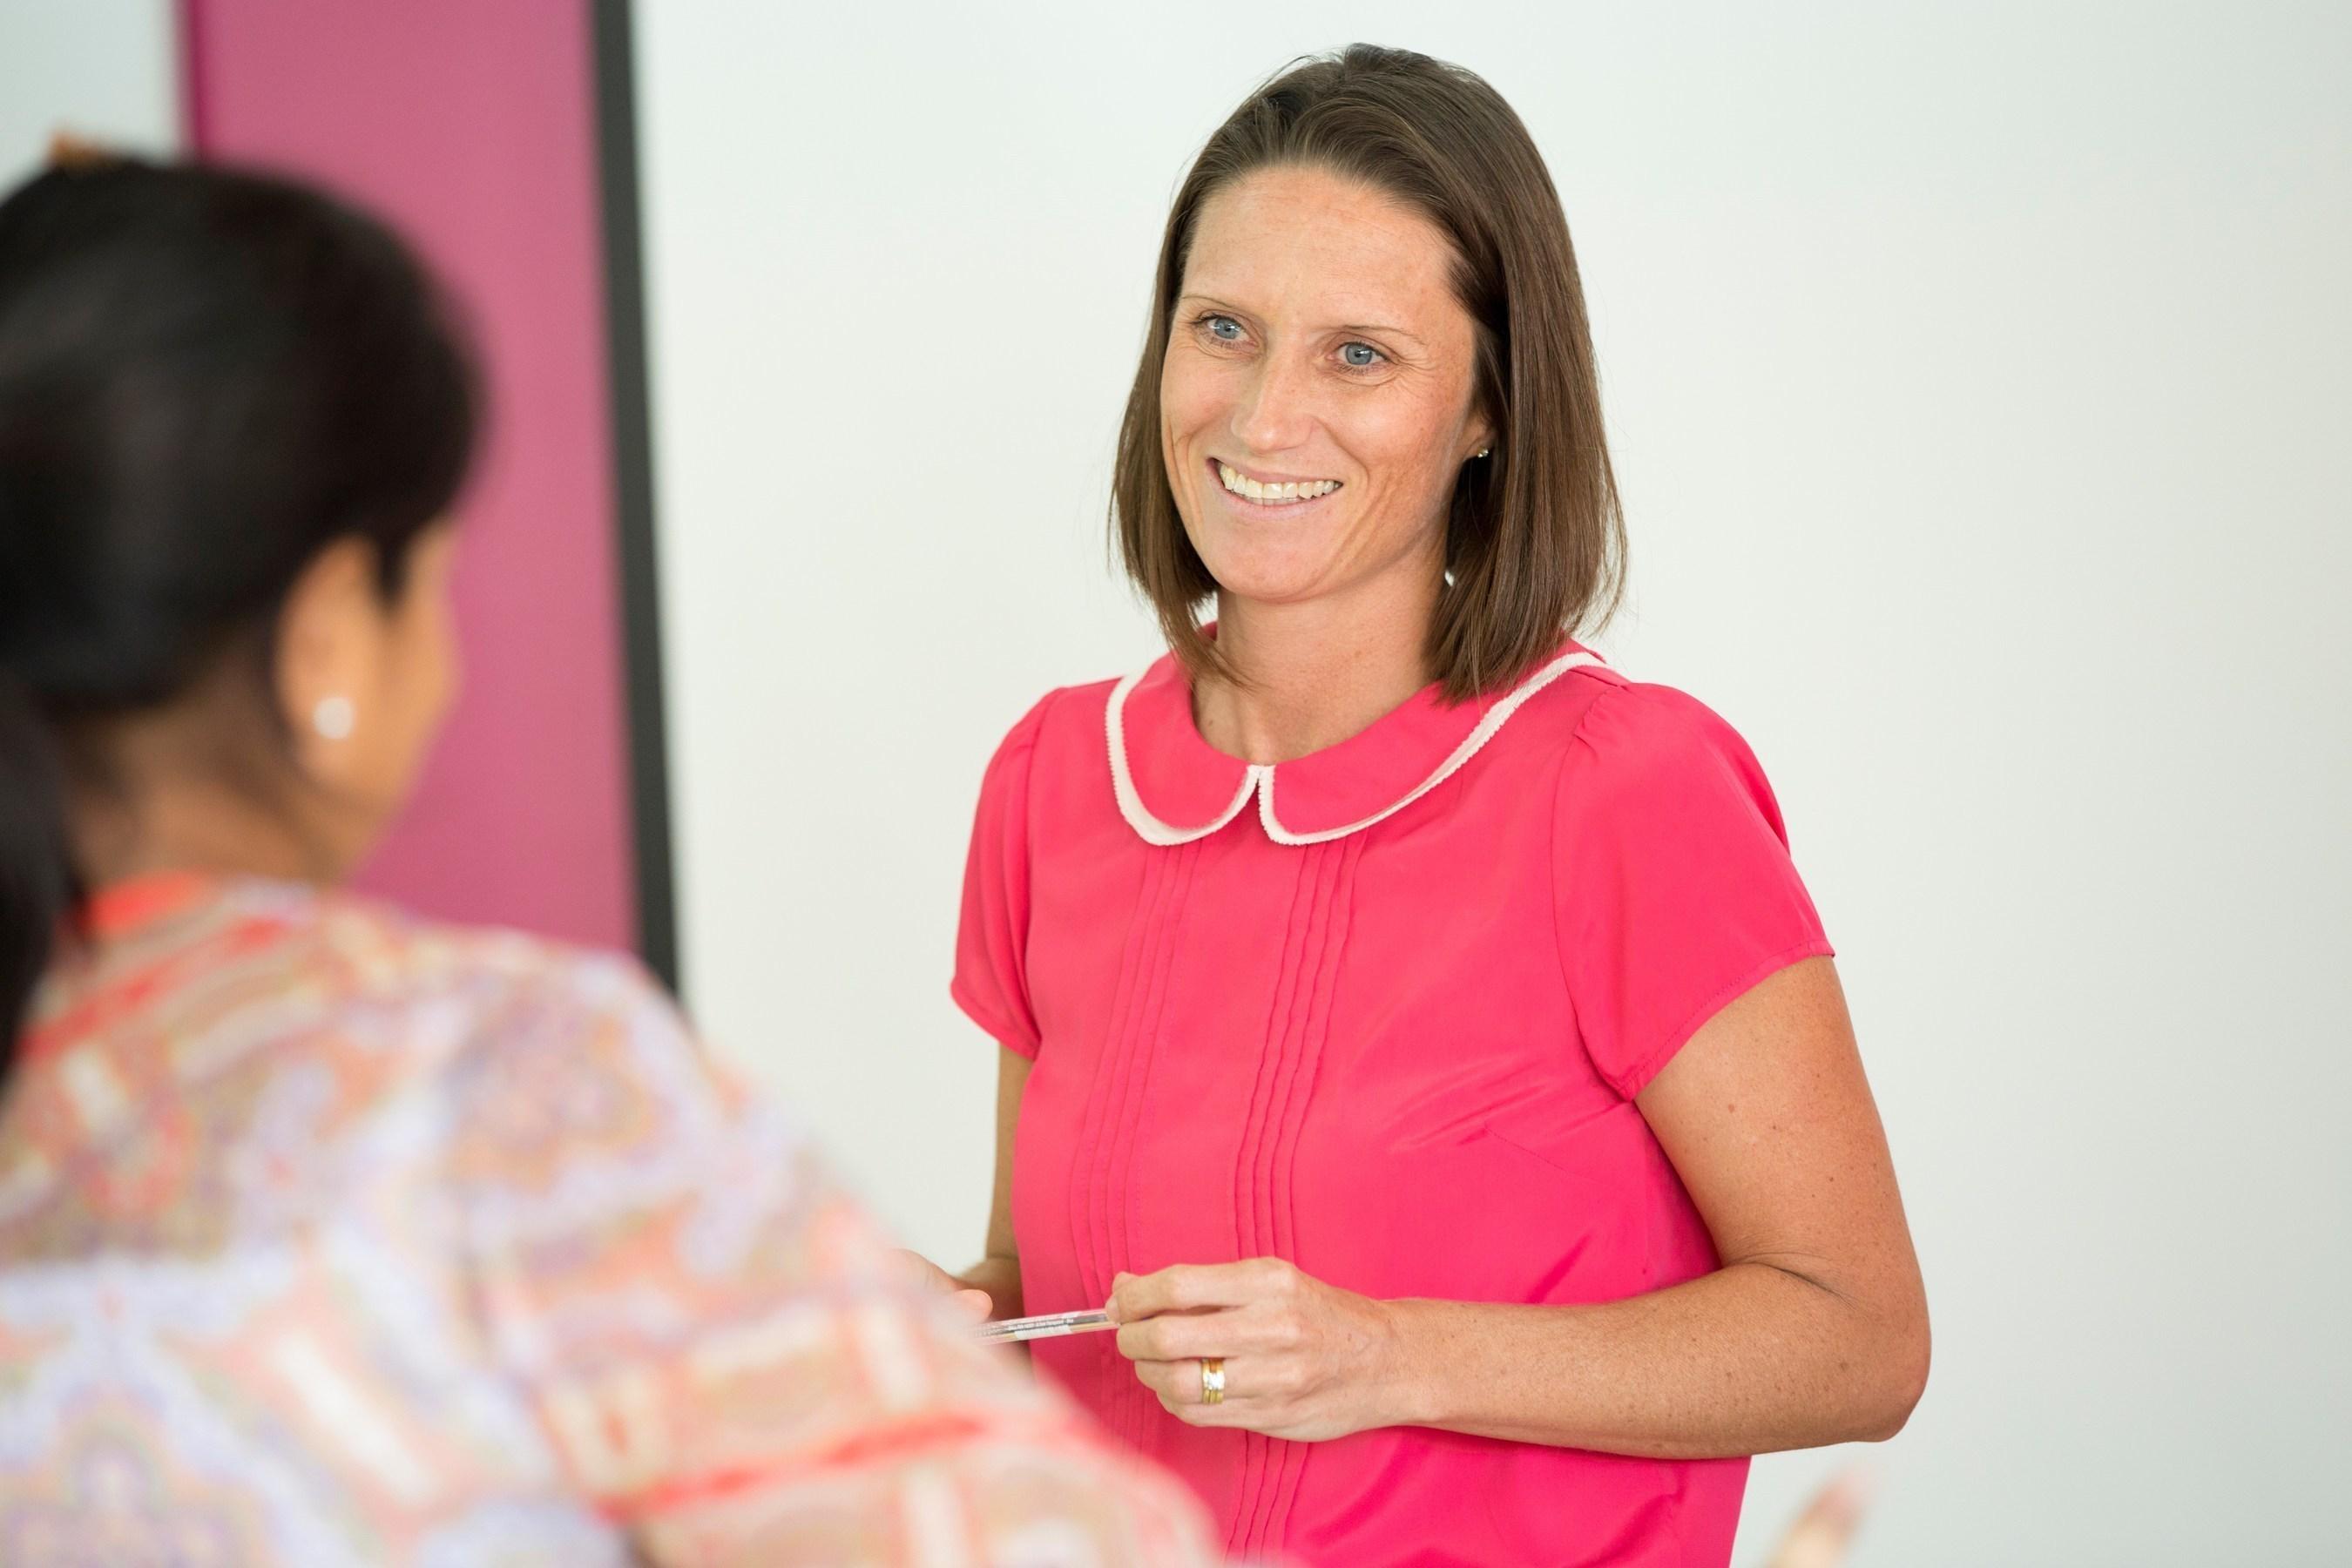 Teachers at a Nord Anglia Education school